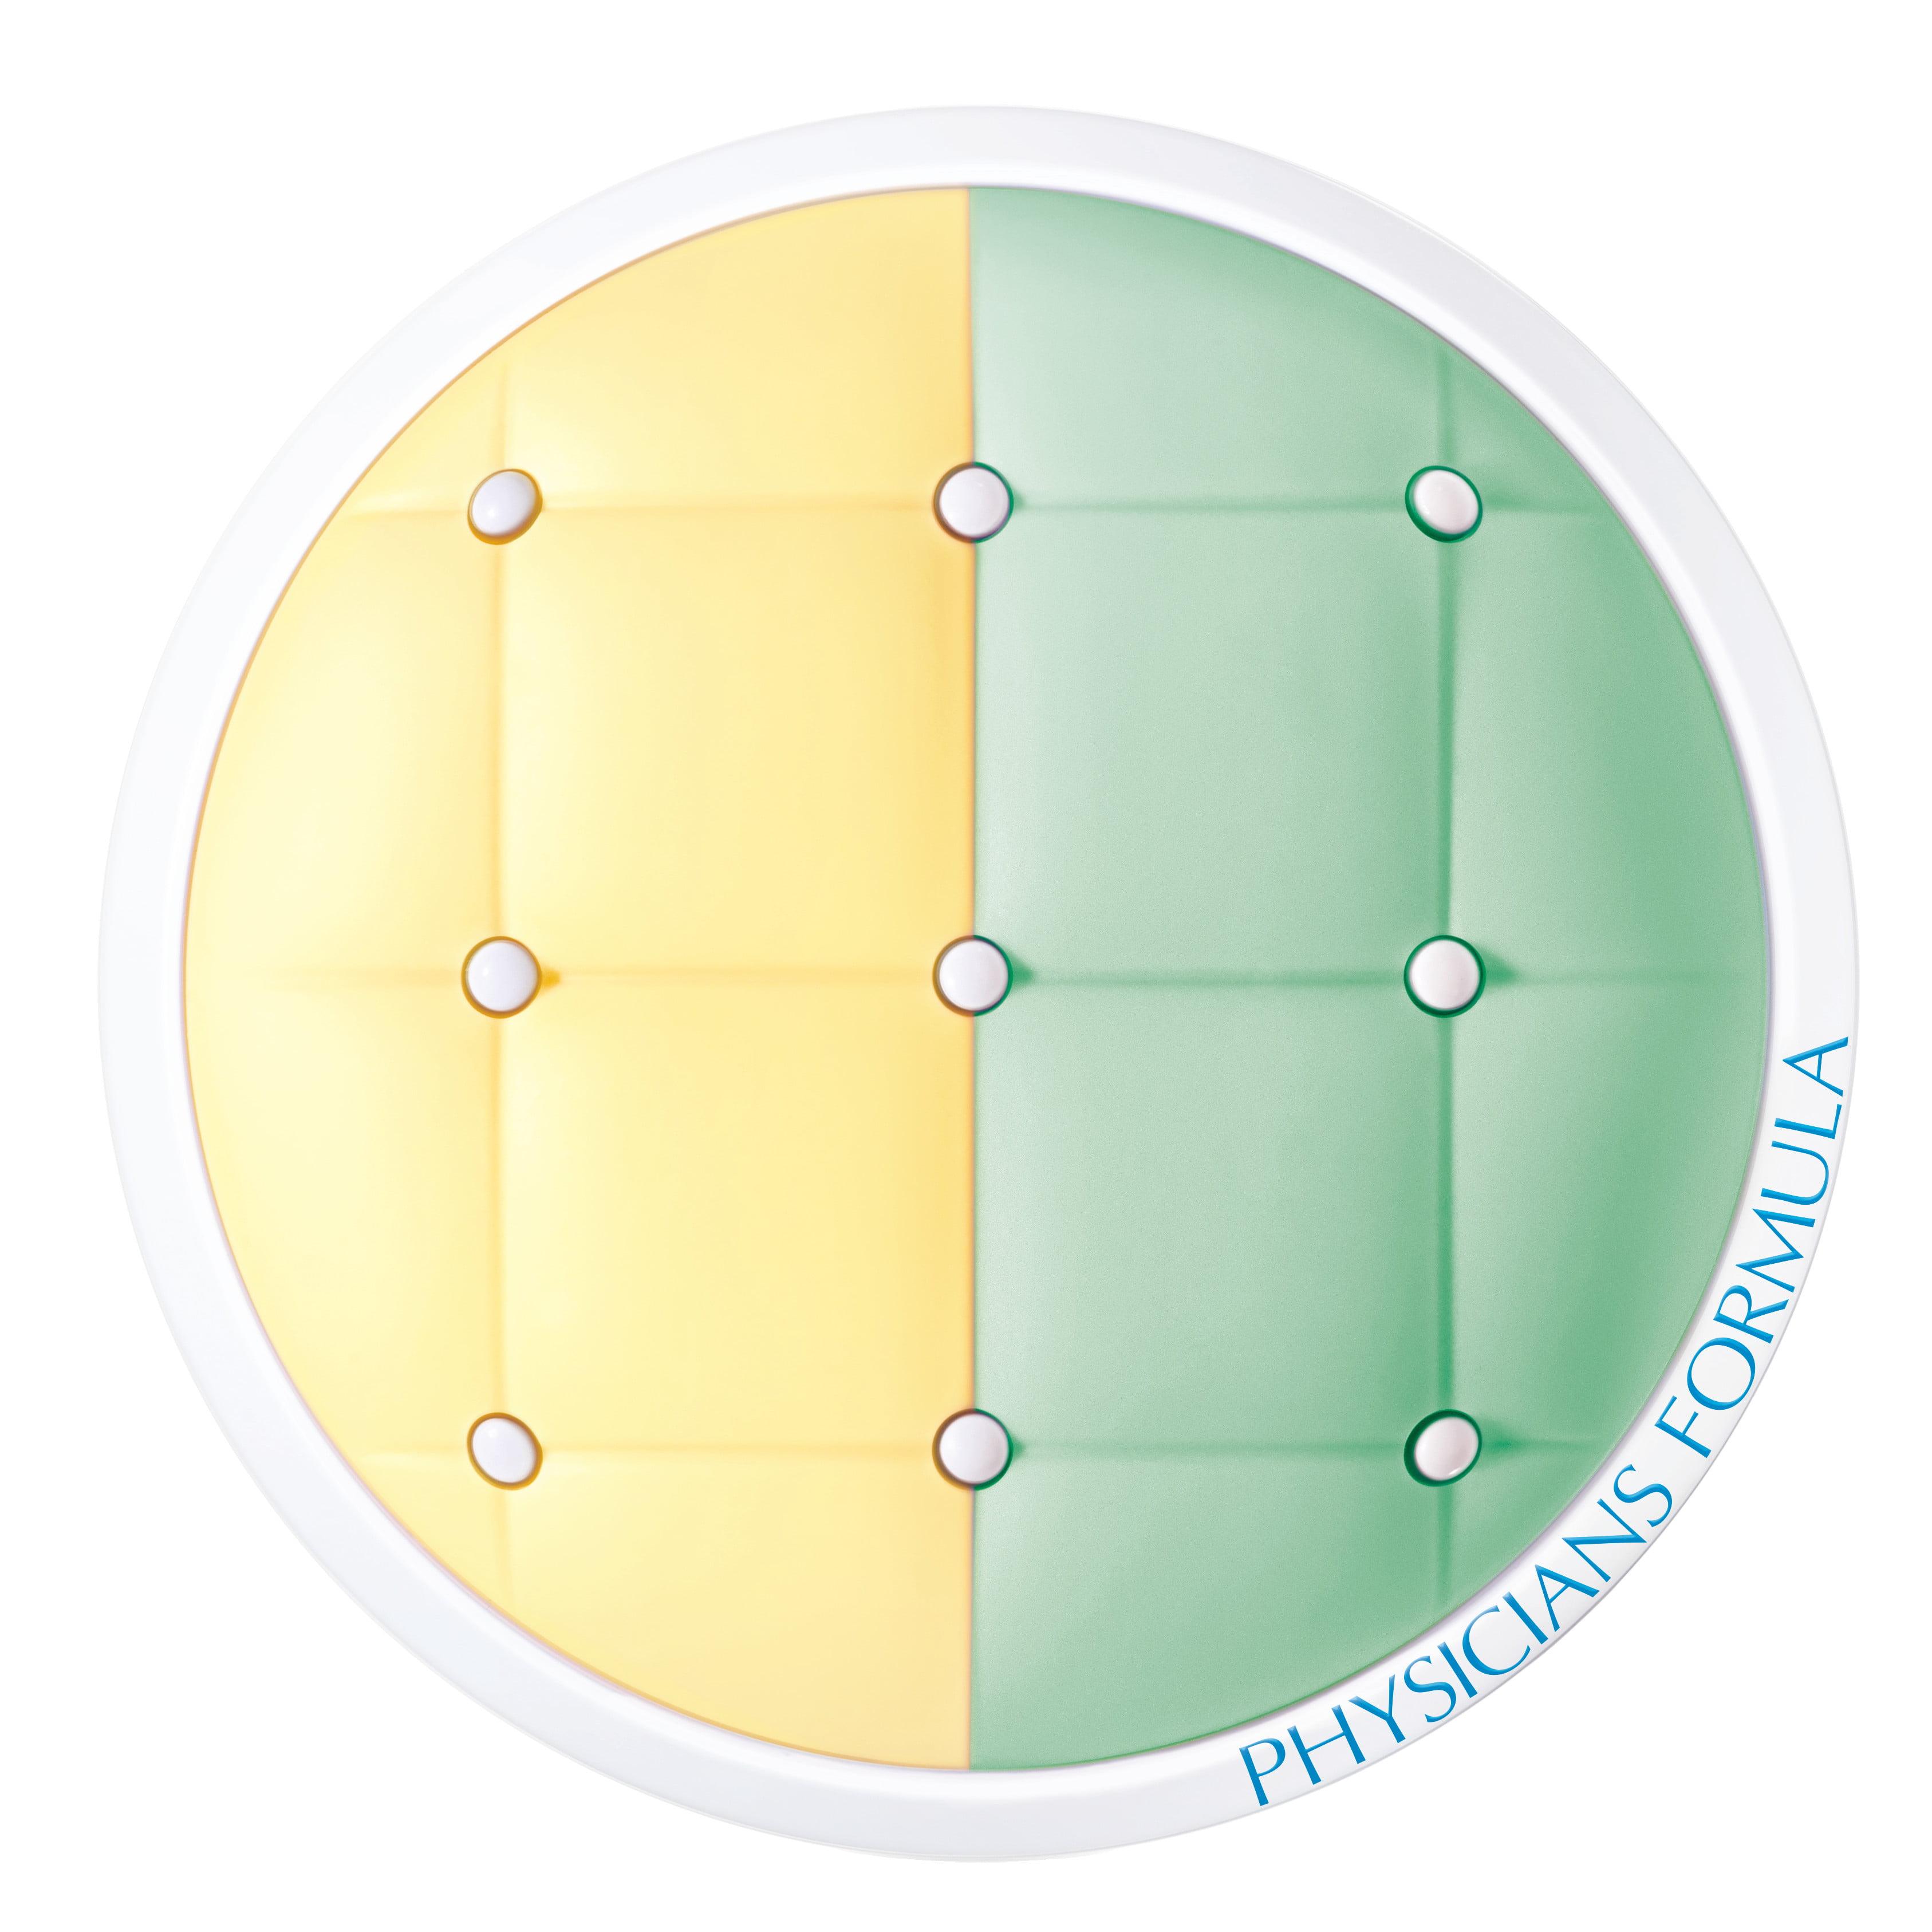 Physicians Formula Mineral Wear Talc-Free Cushion Corrector + Primer Duo SPF 20 - Yellow/